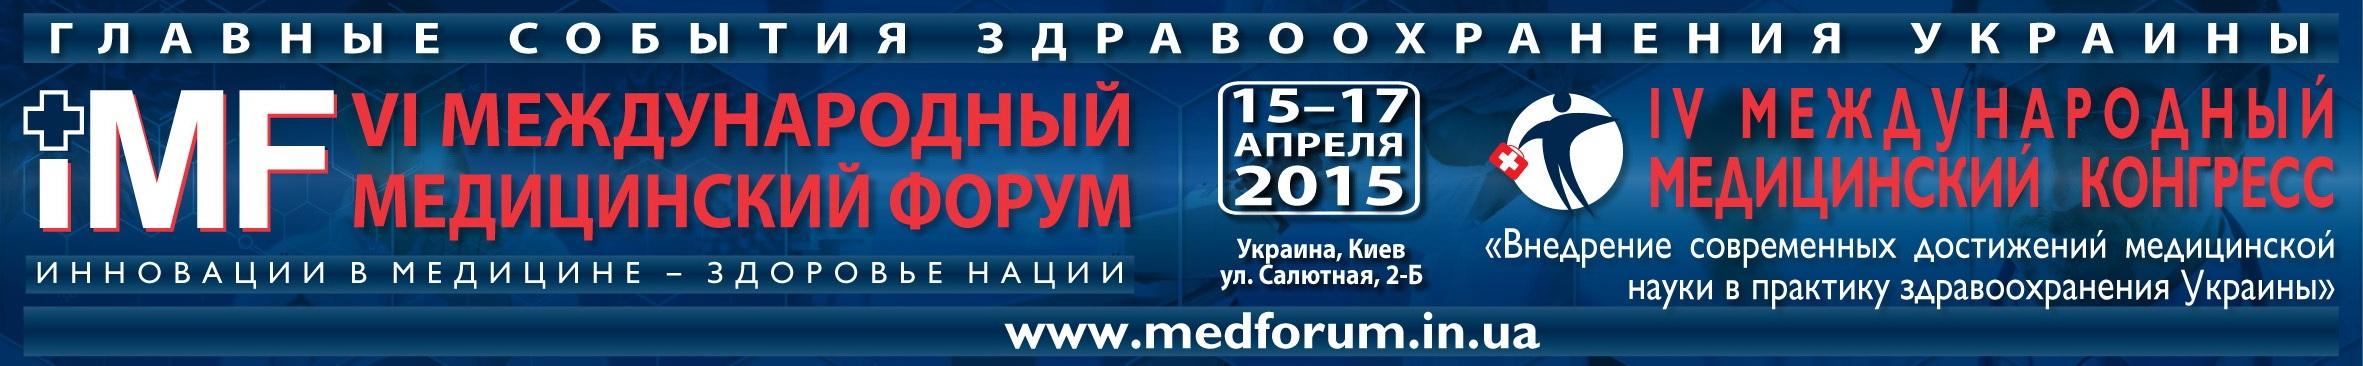 C:\Users\User\Desktop\IMF - 2014\Логотипы\IMF-14_ua-small.gif